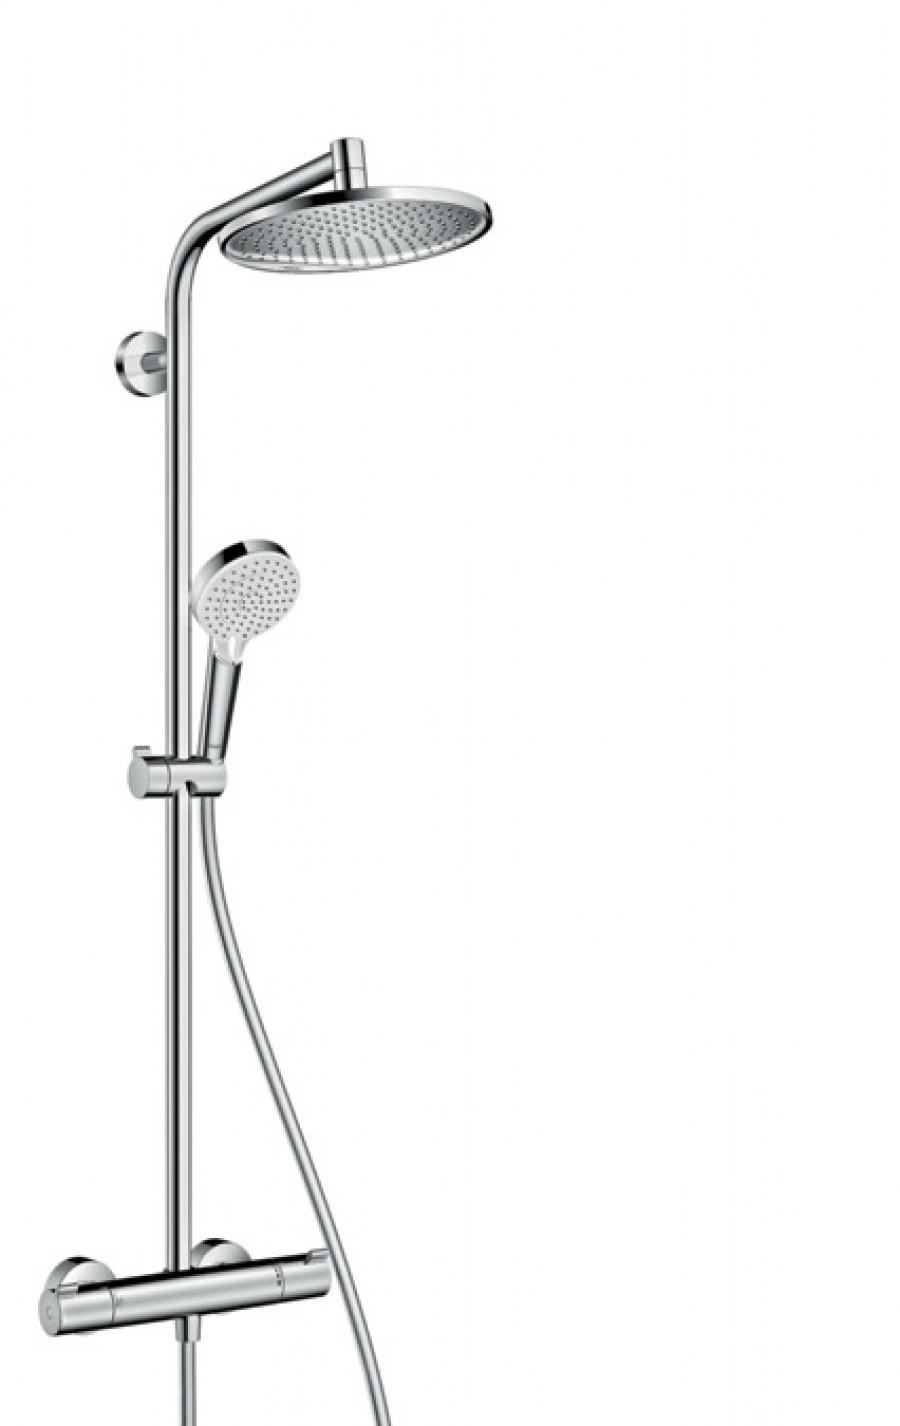 Colonne de douche Crometta S Showerpipe 240 1 jet - 27267000*